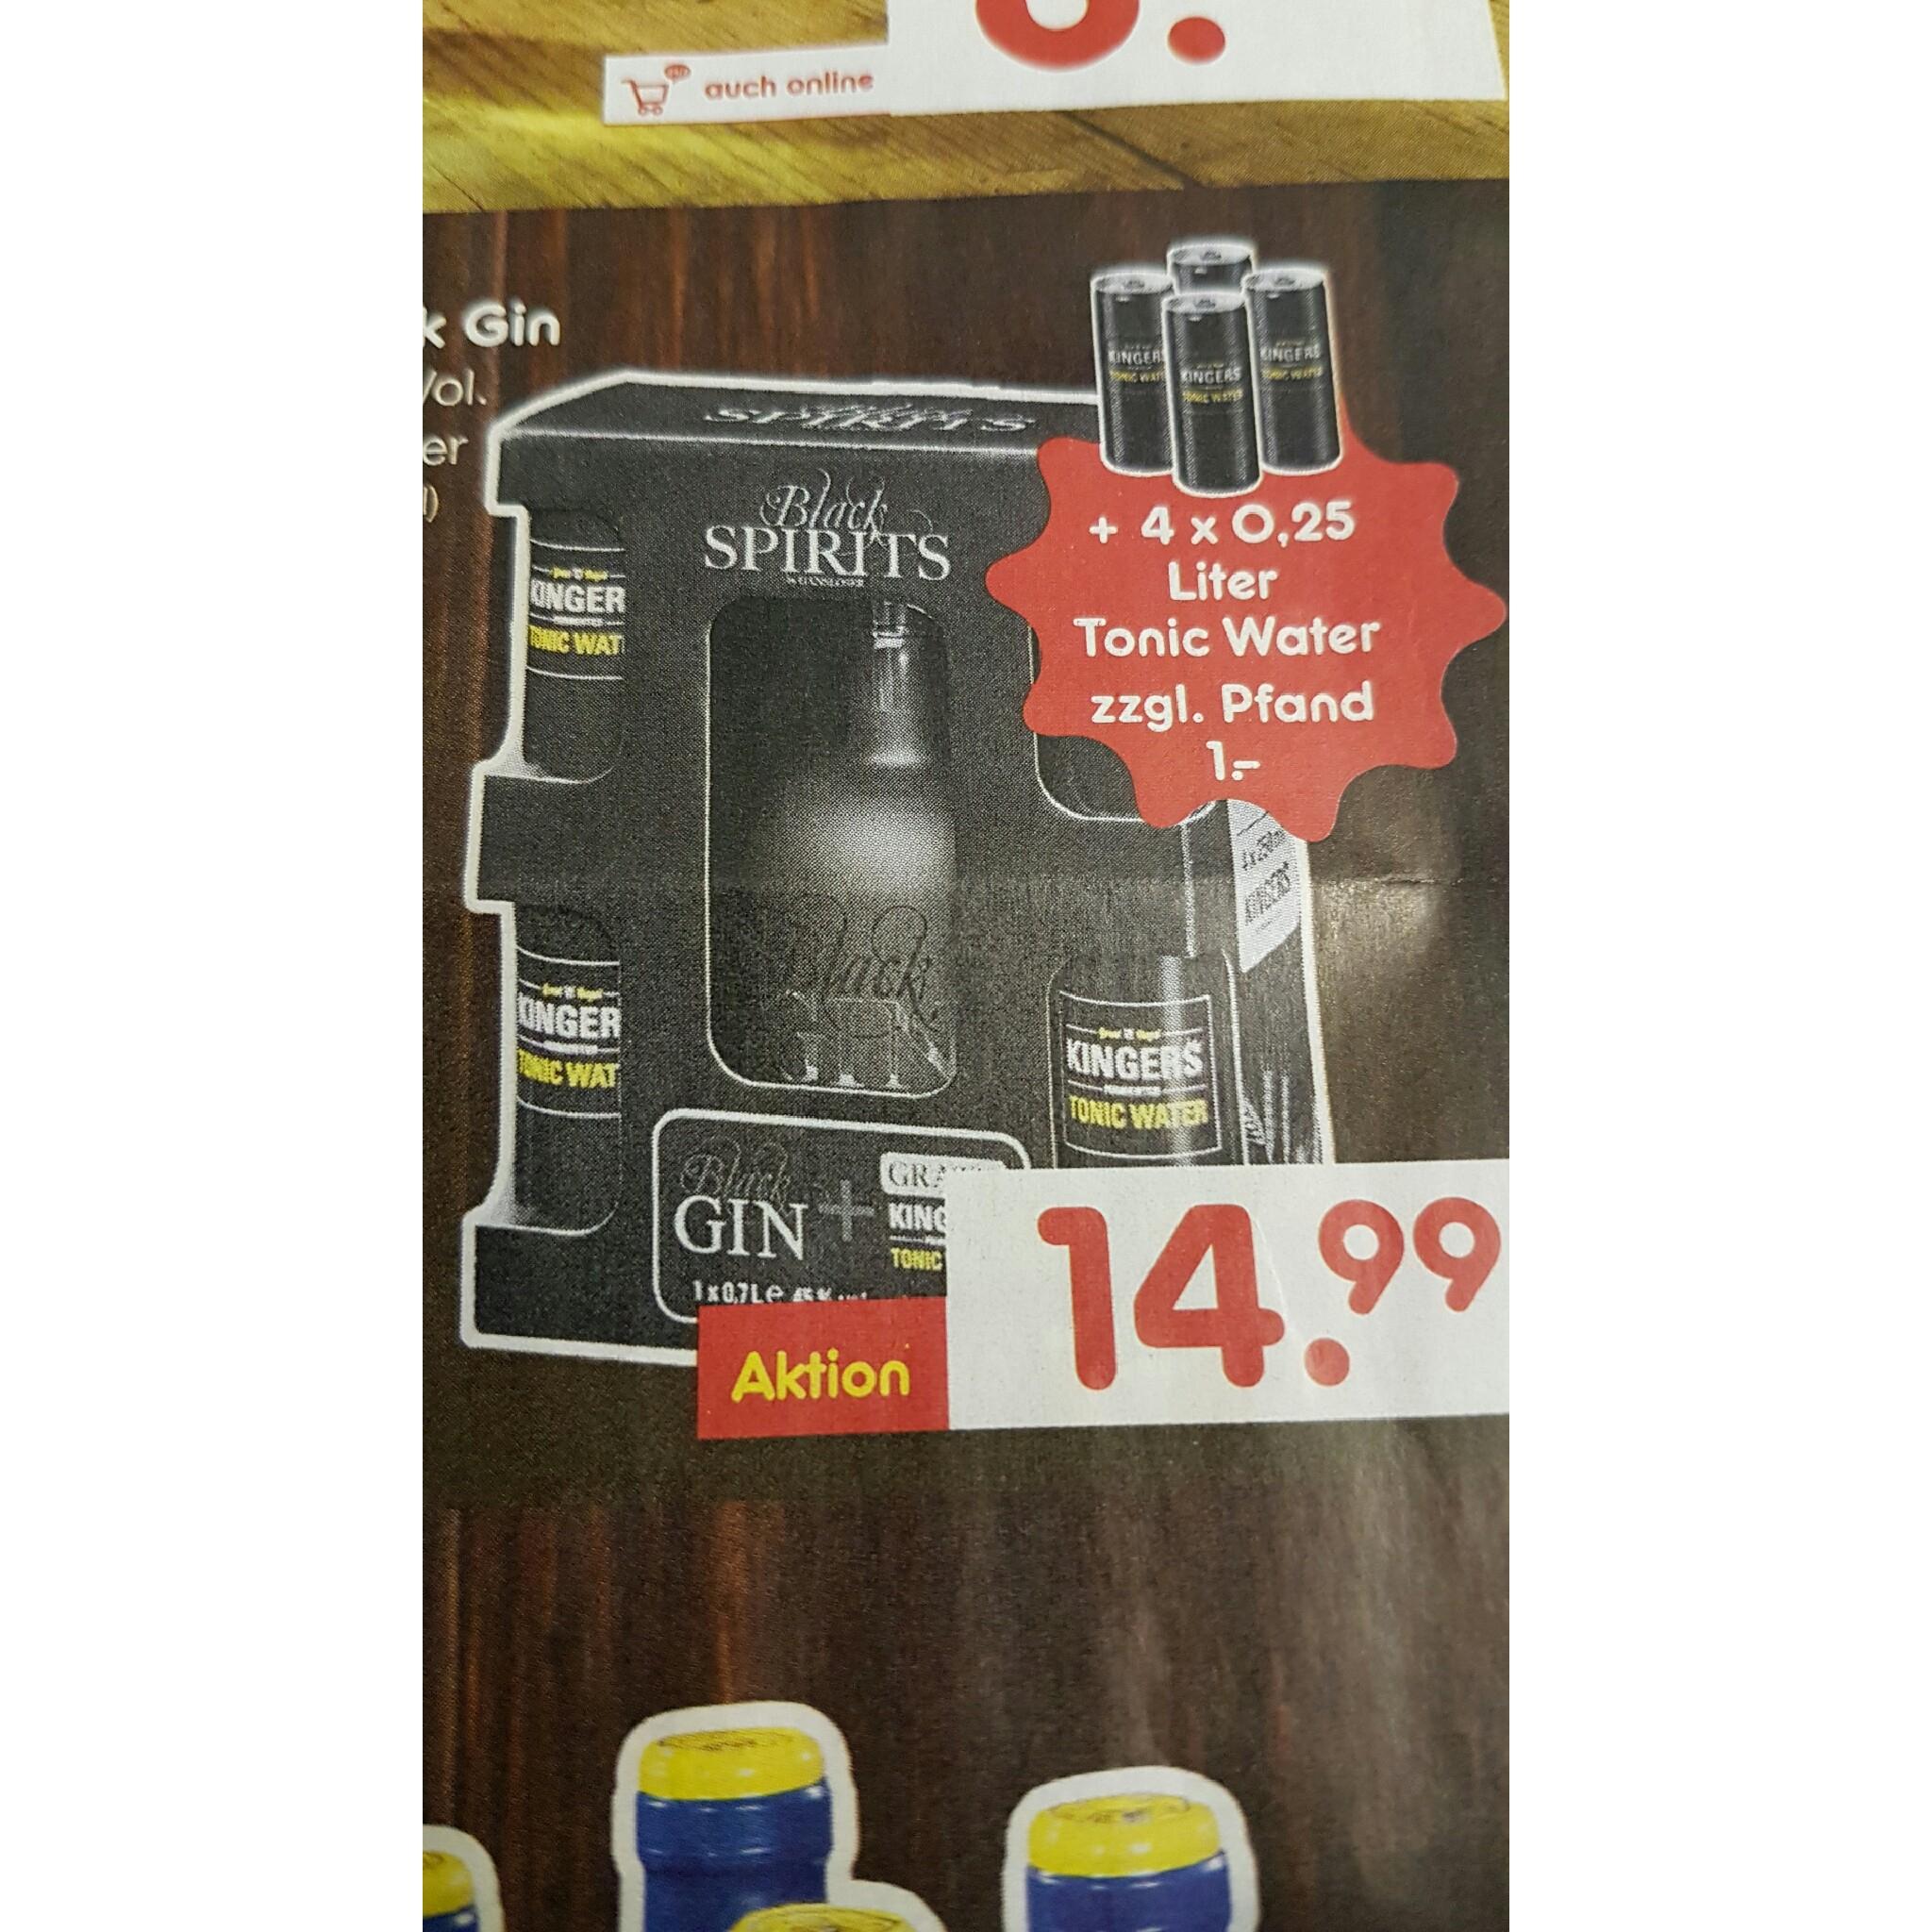 [ Lokal Lingen?]  Netto  (ohne Hund ) Black Gin by Gansloser ink. 4 x 0,25l Tonic Water für 15,99€